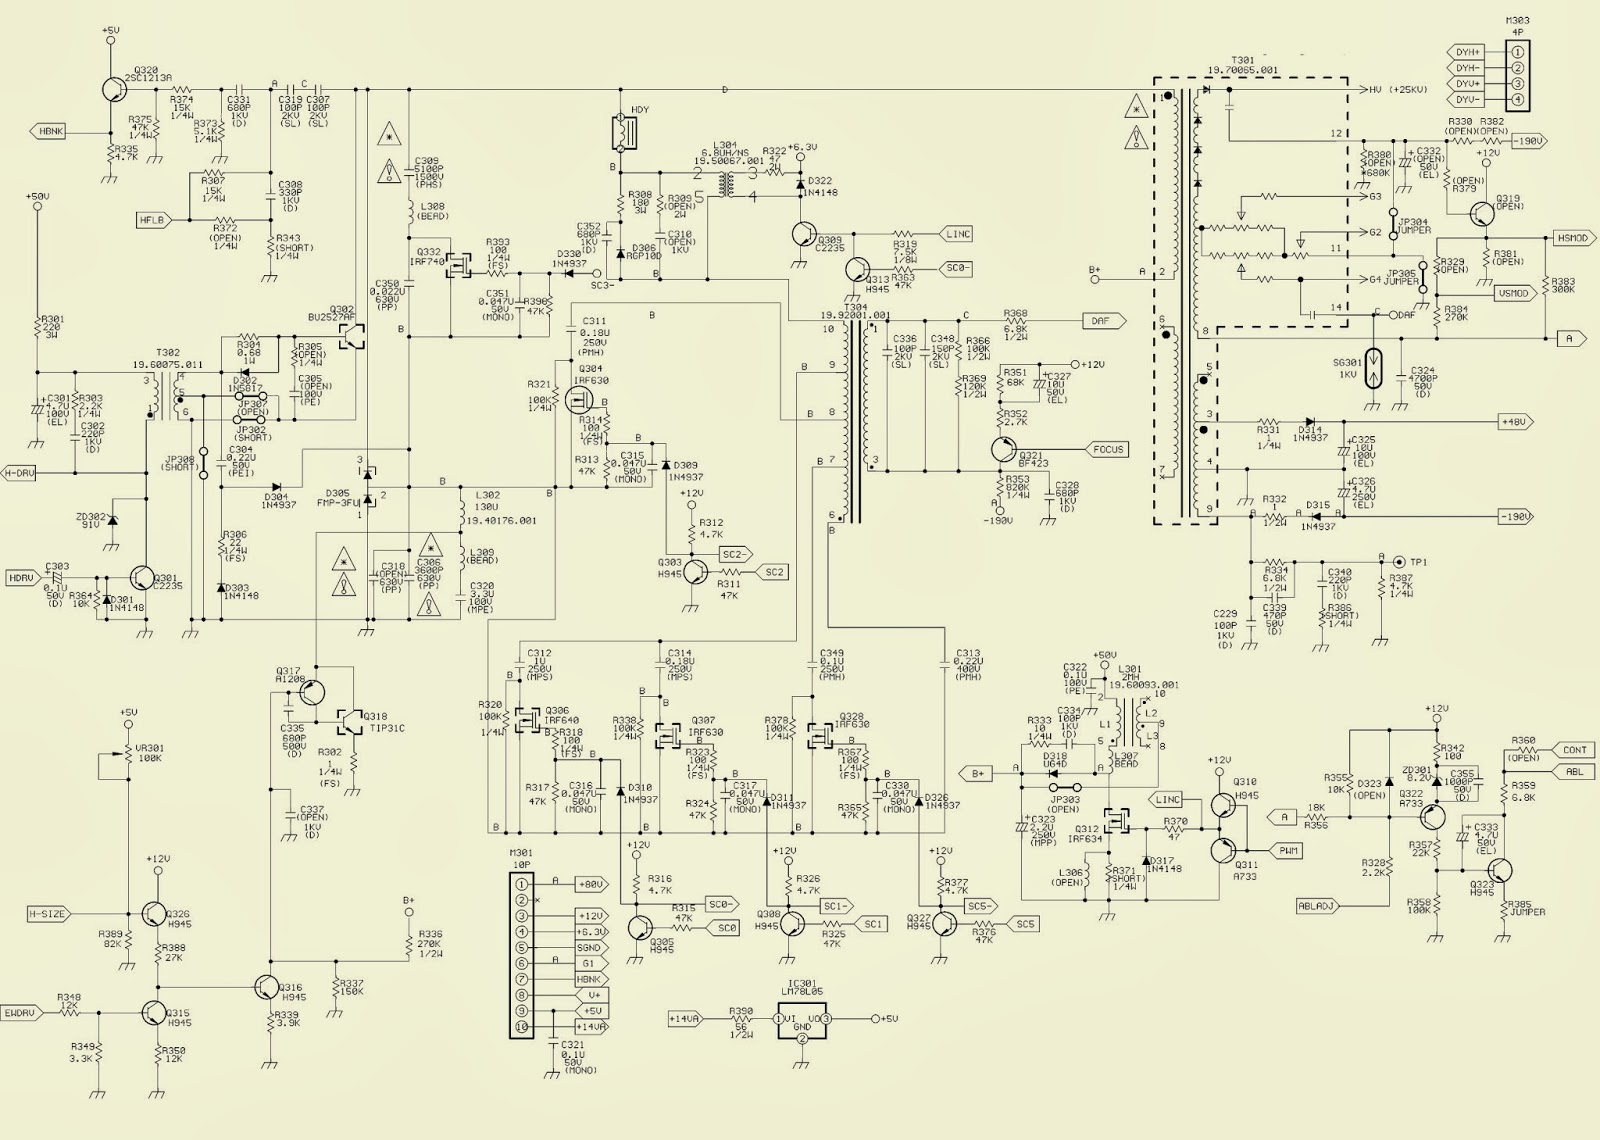 acer benq 17 crt monitor mts1786 horizontal out. Black Bedroom Furniture Sets. Home Design Ideas